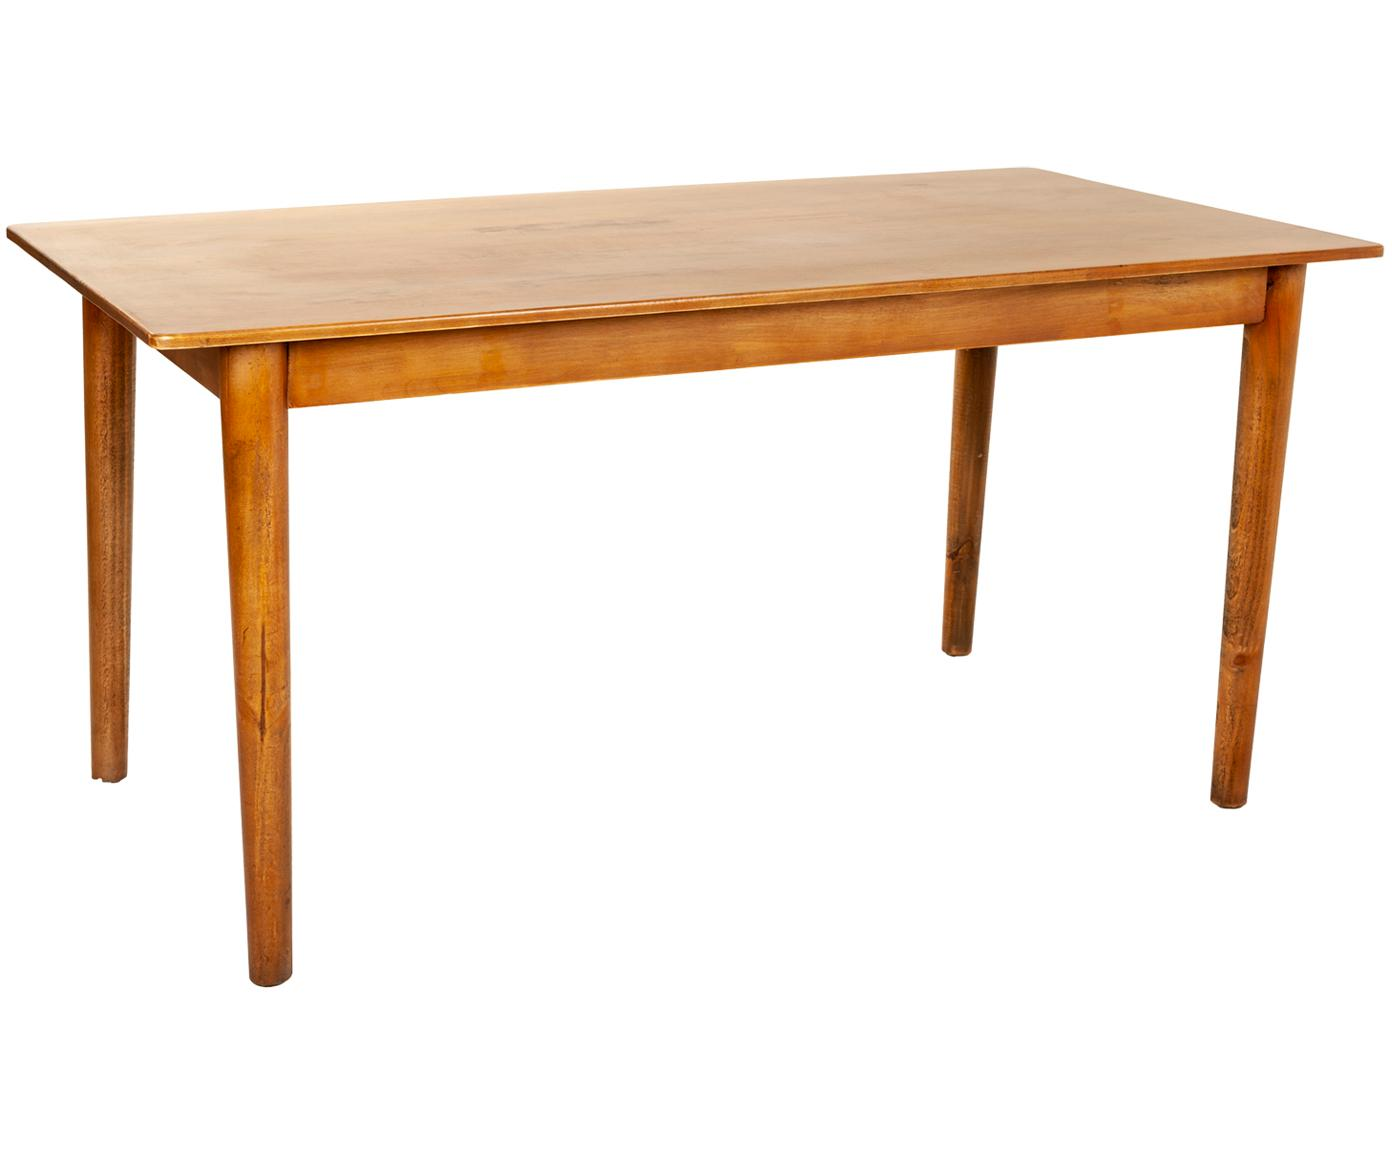 Mesa de comedor Alma, Patas: madera de abeto, Tablero: fibras de densidad media , Marrón, An 150 x F 80 cm